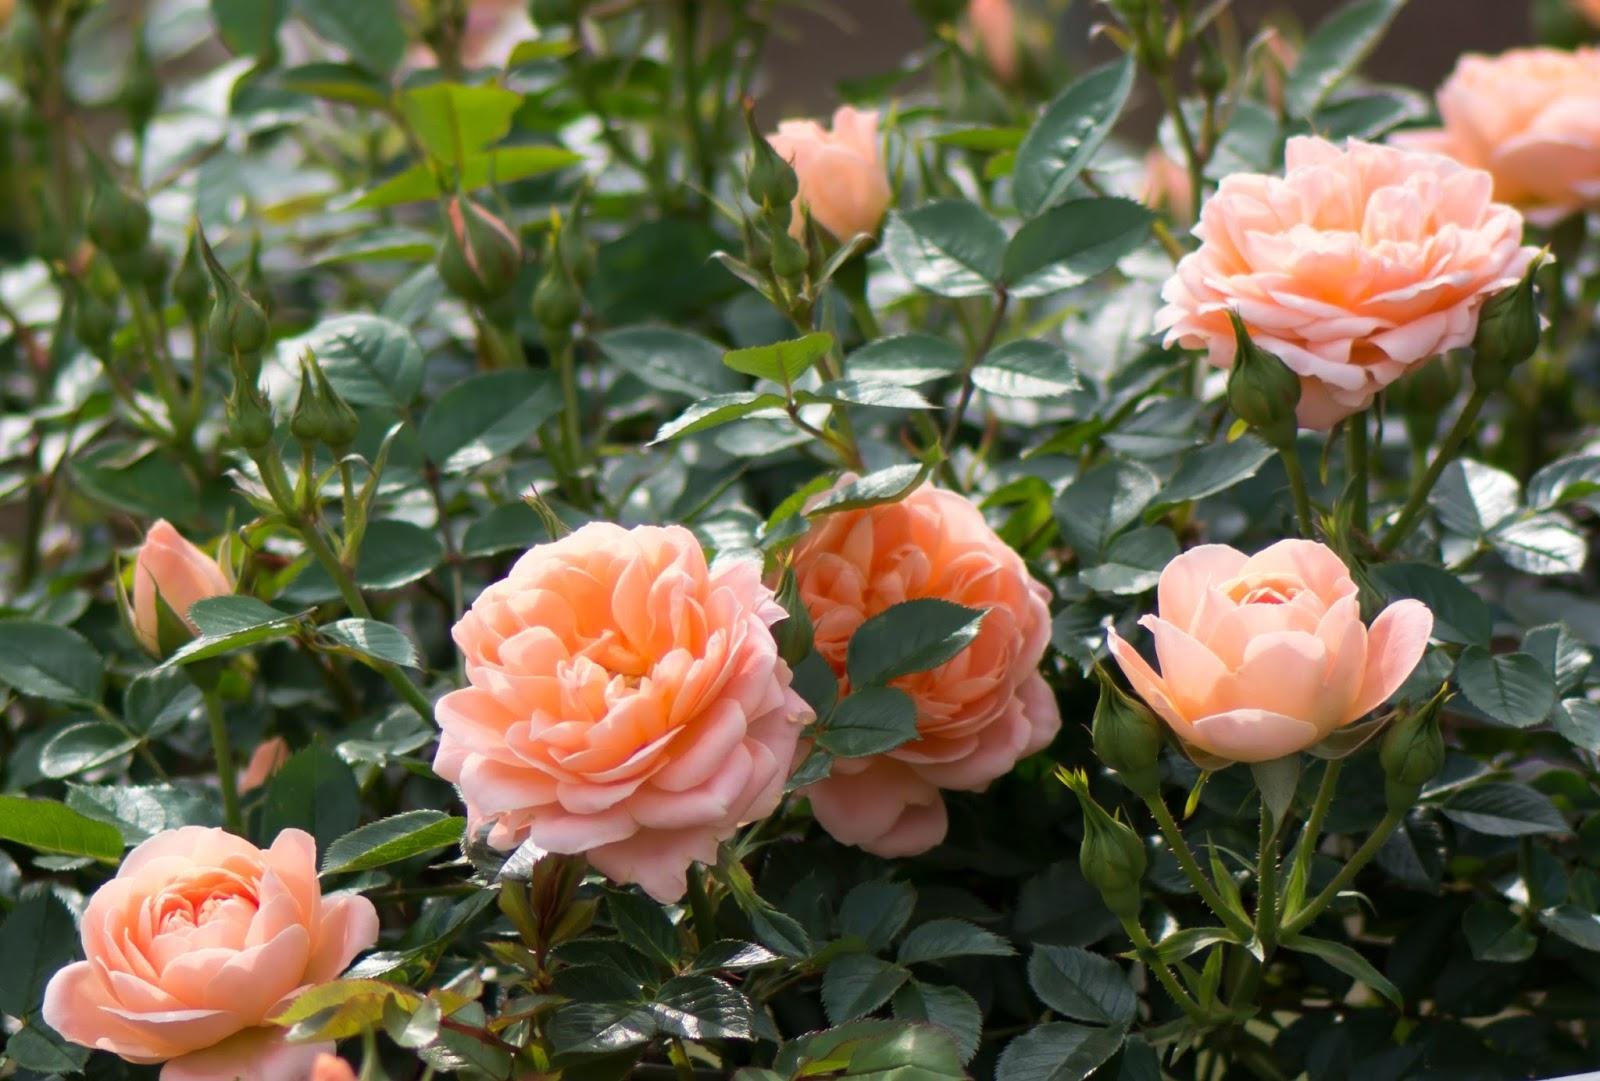 promesse de roses roses anciennes d 39 hier et d 39 aujourd 39 hui. Black Bedroom Furniture Sets. Home Design Ideas